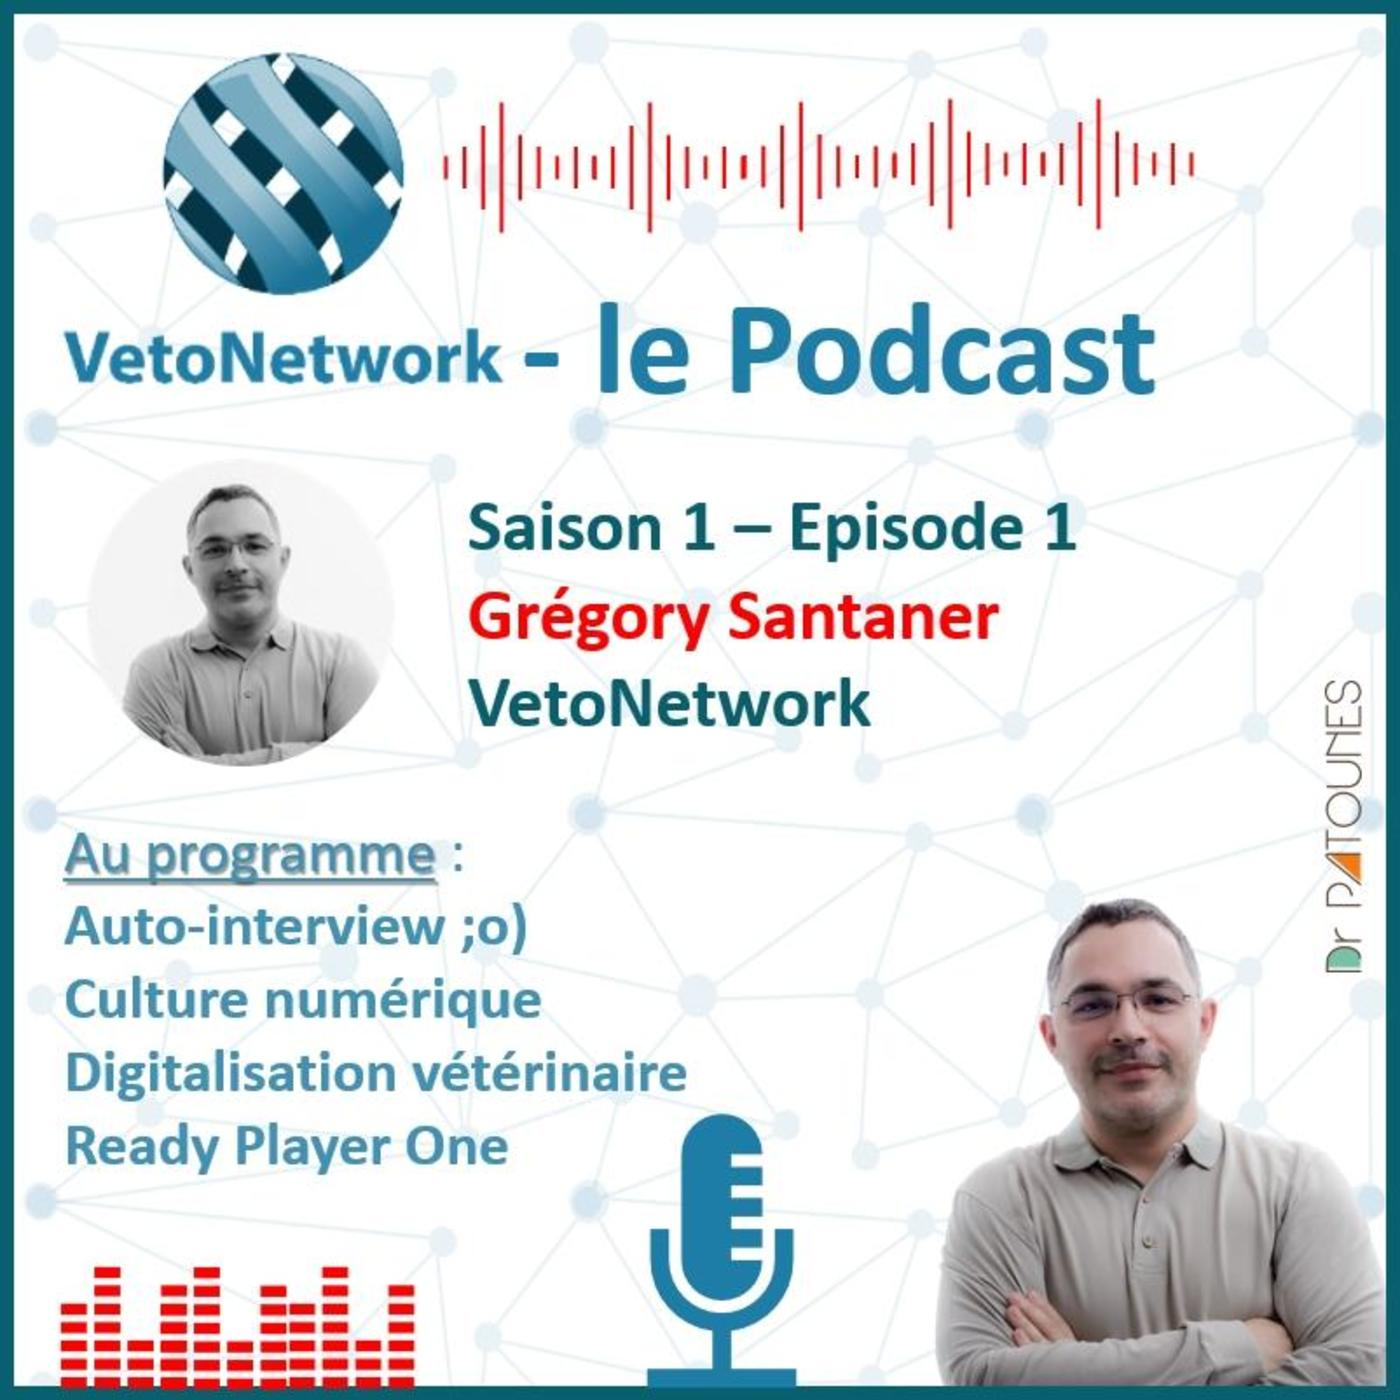 🩺 Grégory Santaner (auto-interview) 📲